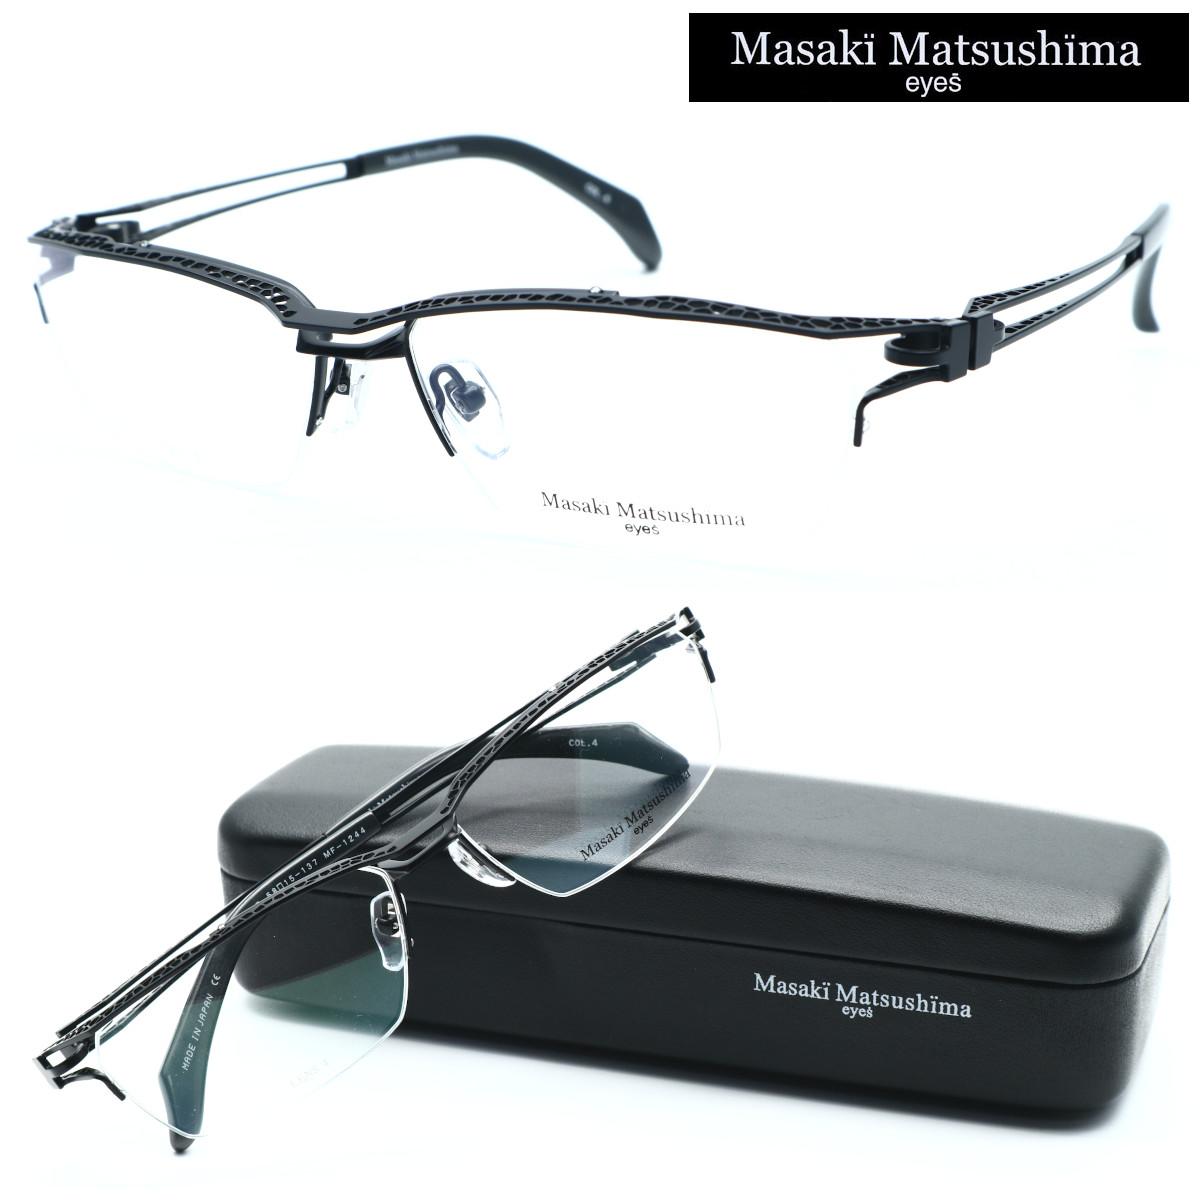 【Masaki Matsushima】マサキマツシマ MF-1244 col.4 メガネ 度付又は度無レンズセット【正規品】【店内全品送料無料】